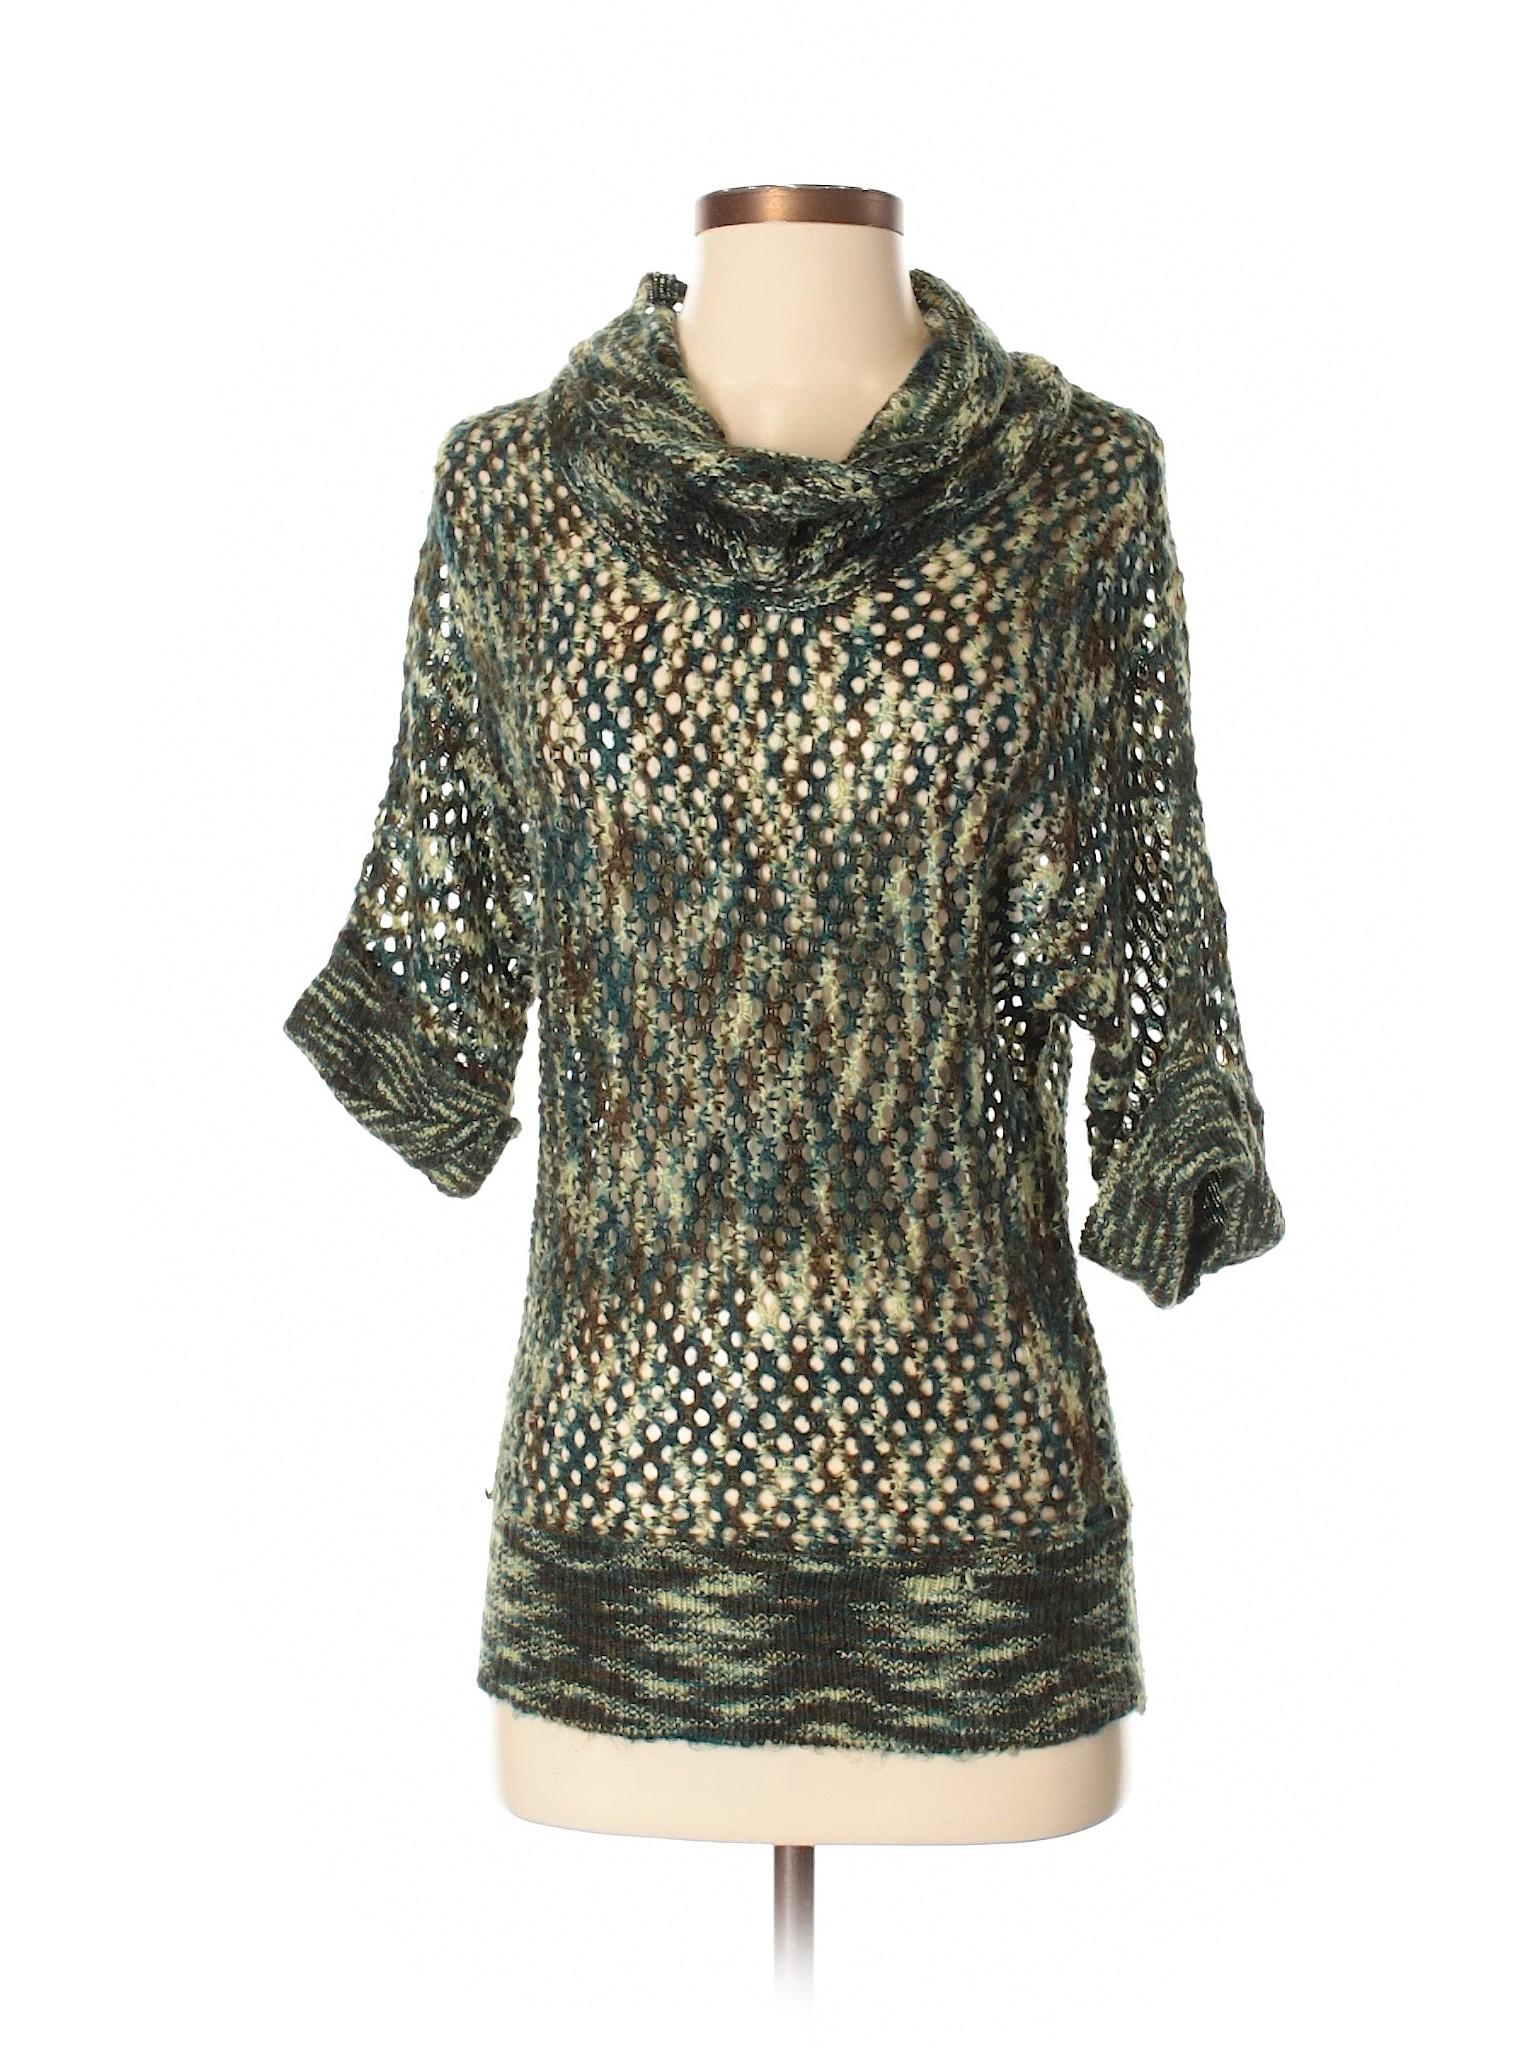 Pullover Boutique Sweater DressBarn Pullover winter Boutique DressBarn winter Boutique Sweater 8xwpg